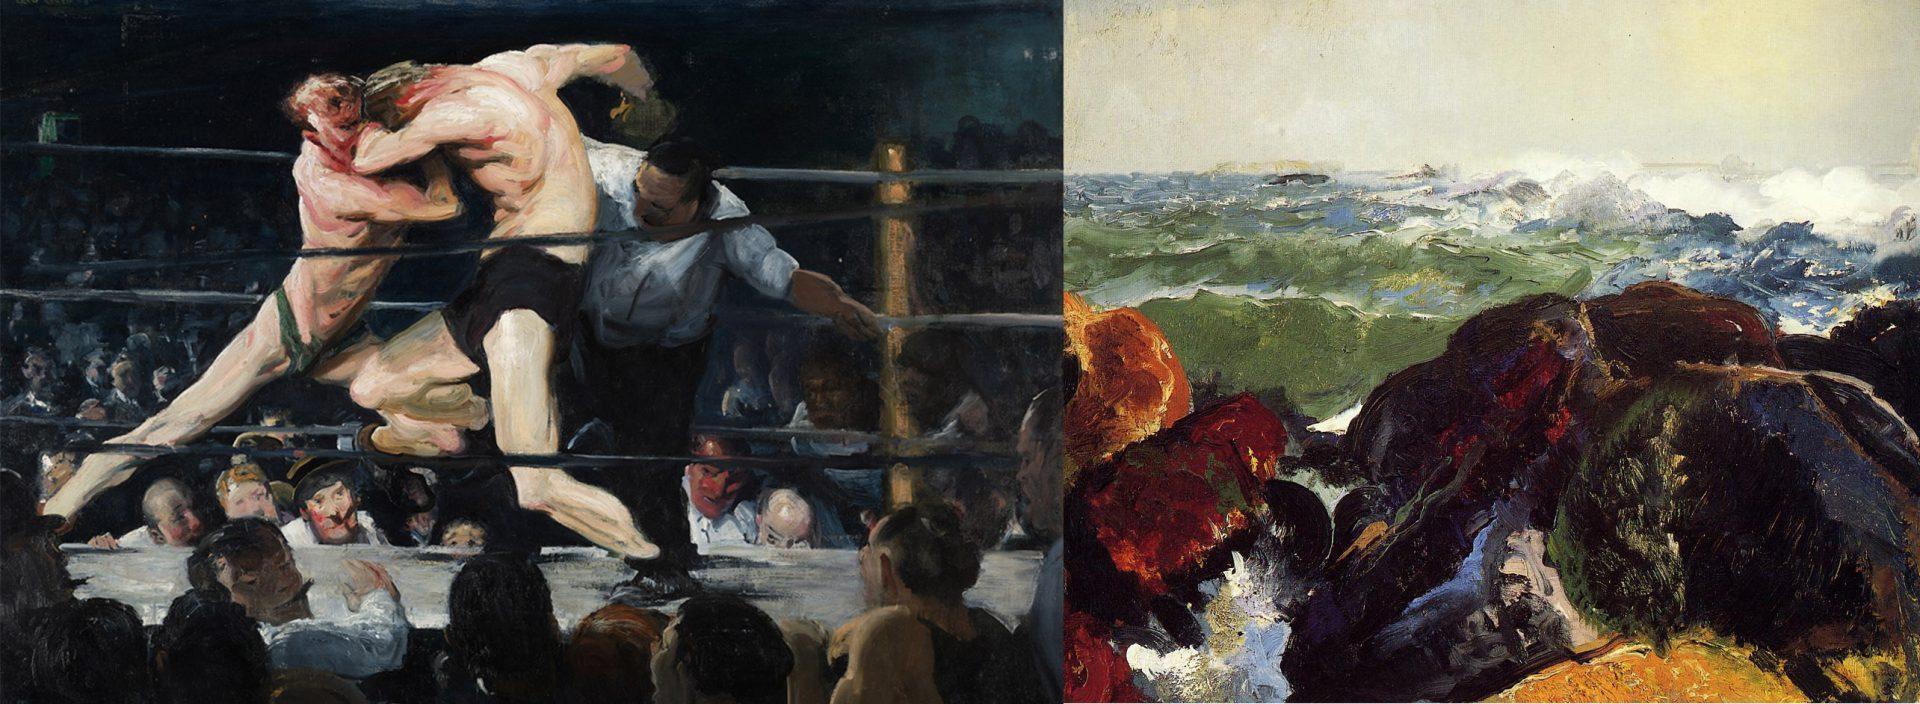 George Bellows - Stag at Sharkey's and Monhegan-Island.jpg